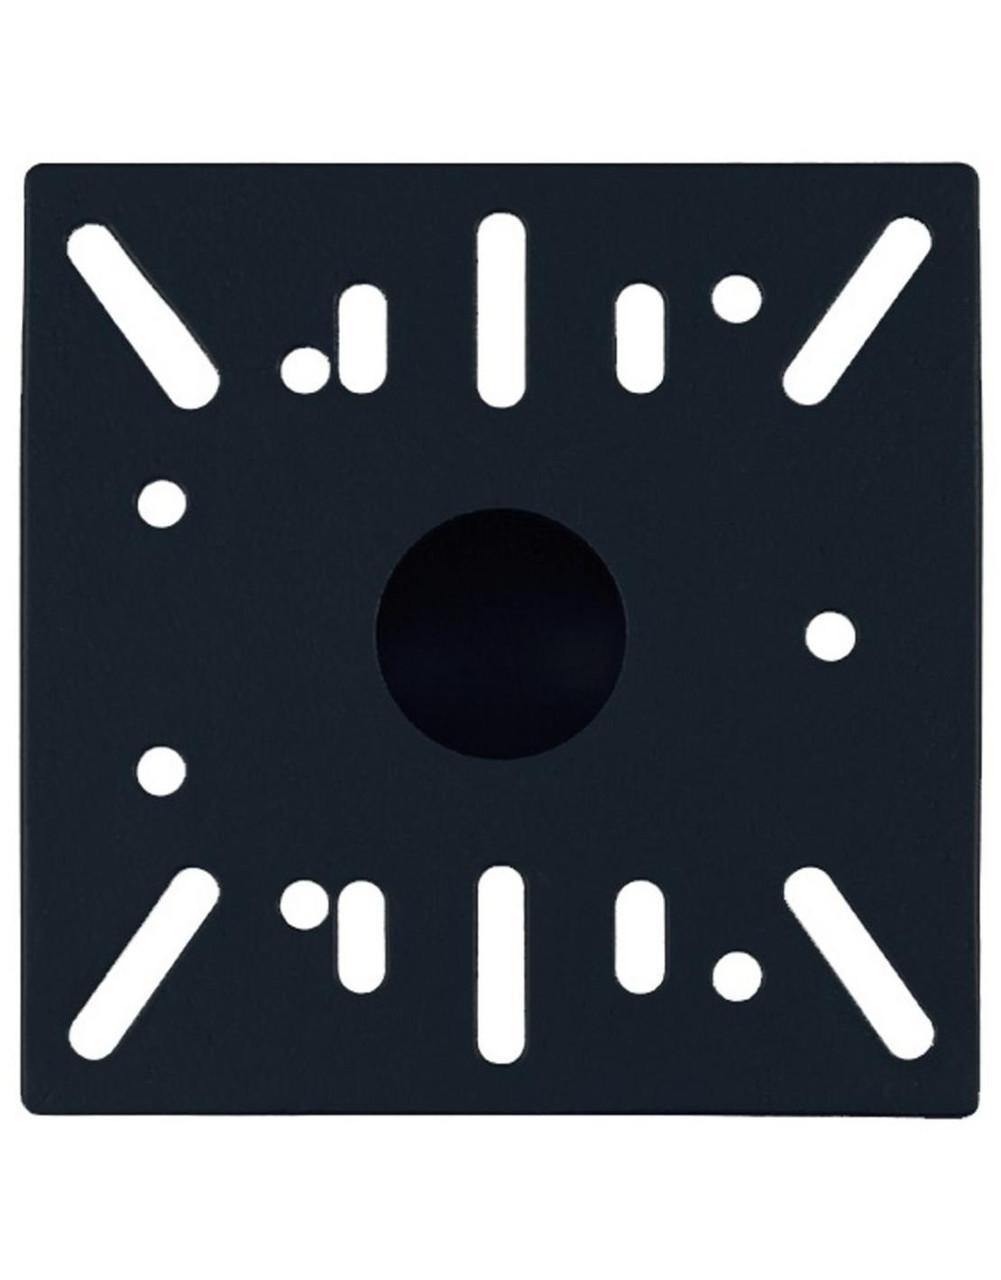 Phenomenal Palmgren Bench Grinder Pedestal Stand Pdpeps Interior Chair Design Pdpepsorg